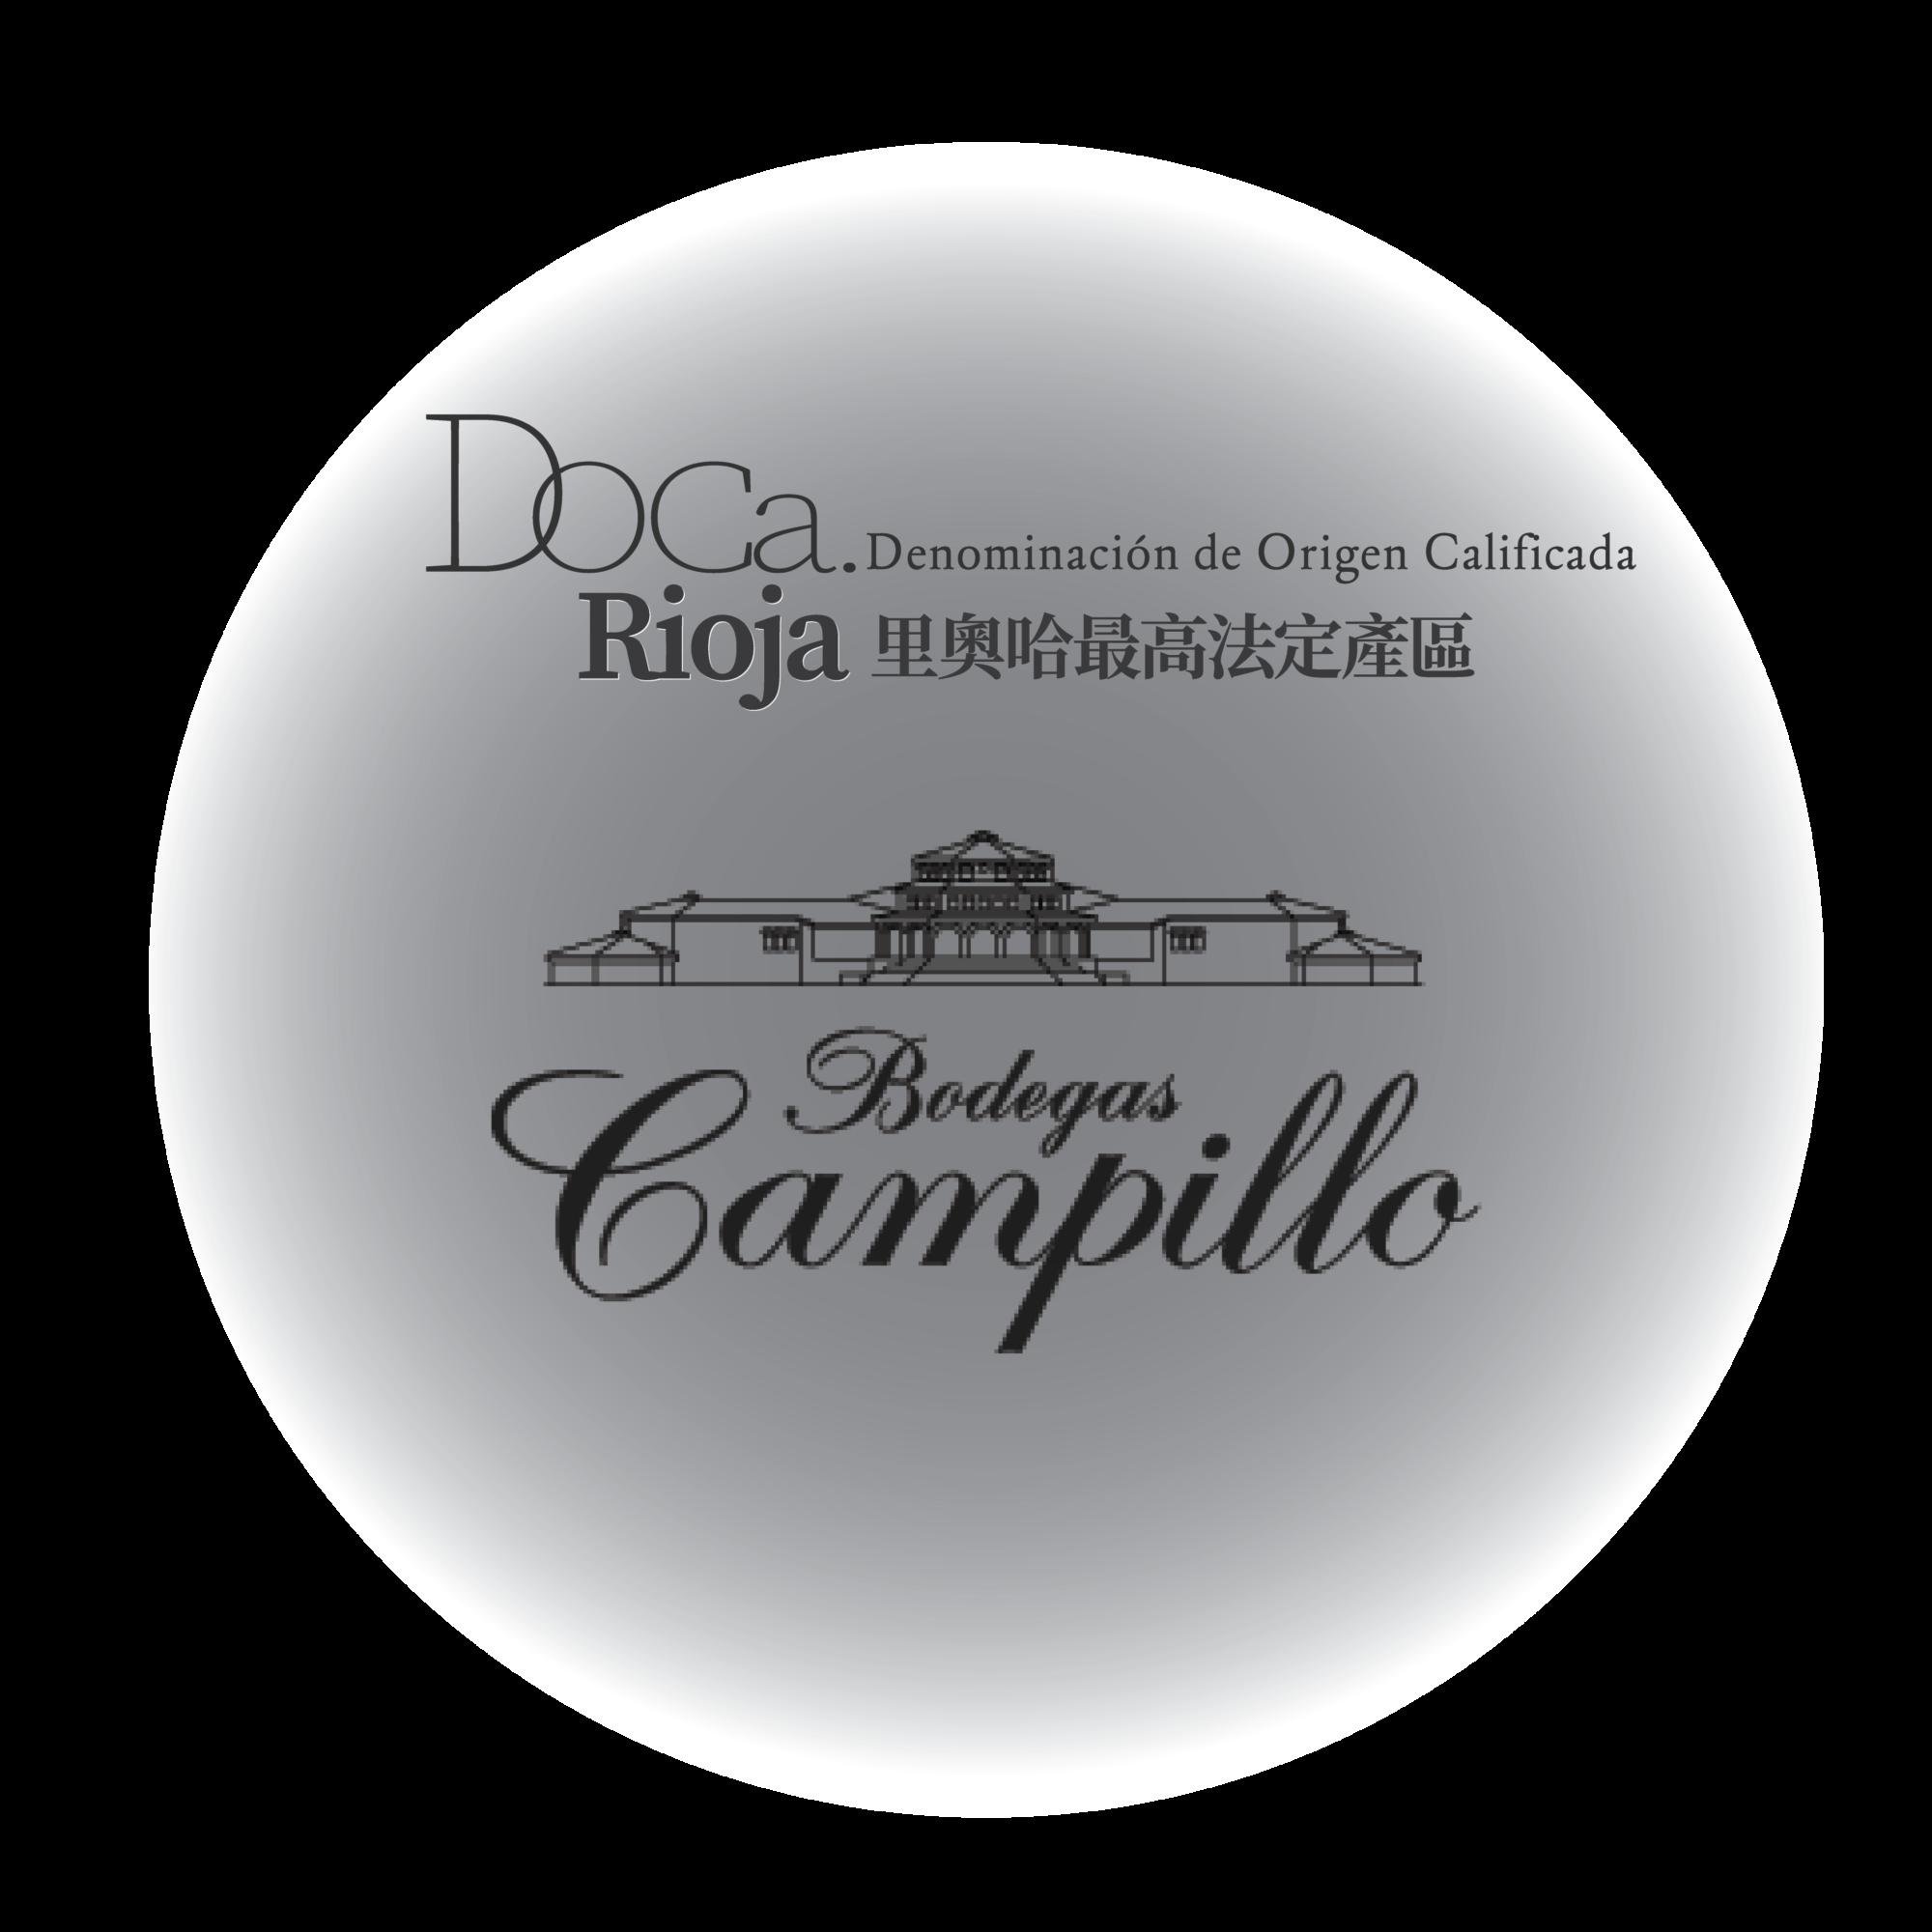 Bodega Campillo